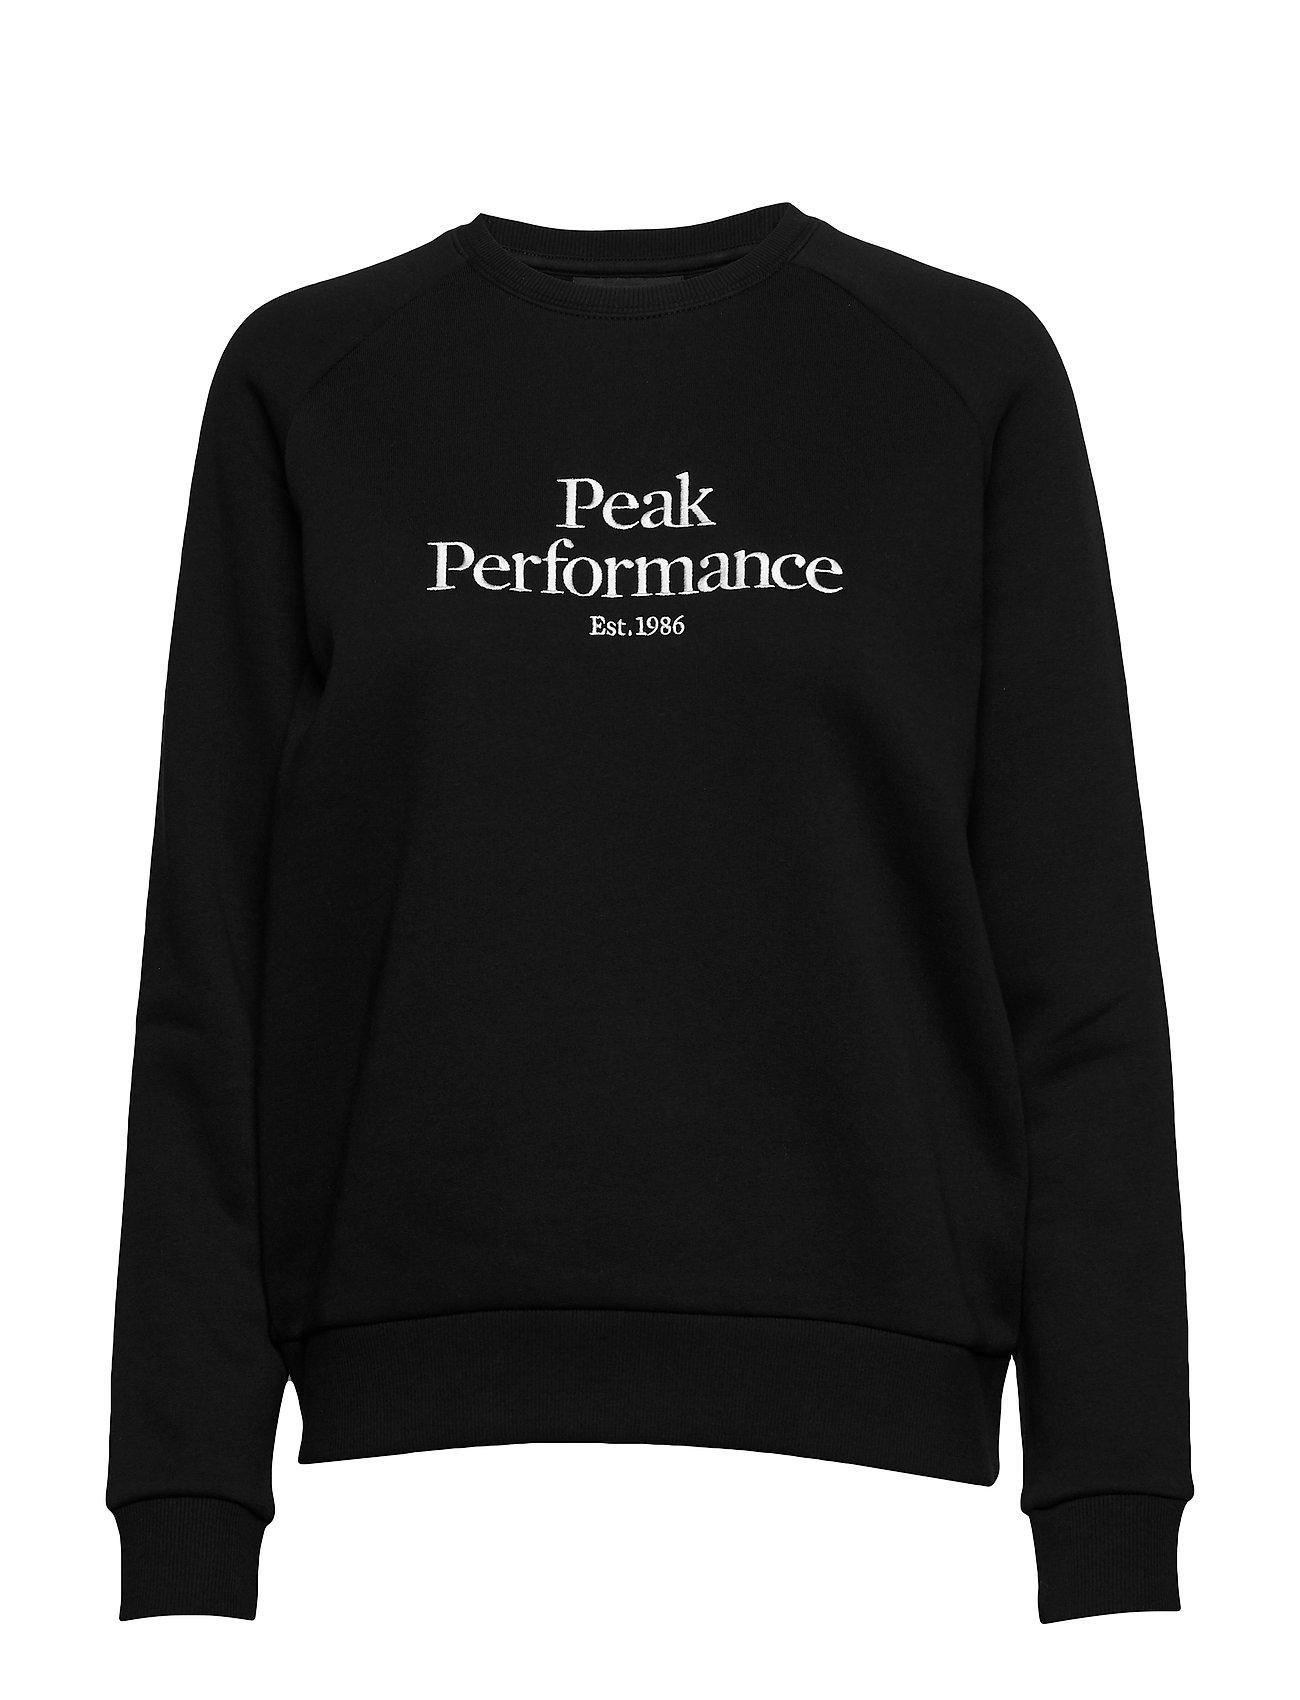 Peak Performance W ORIG C - BLACK